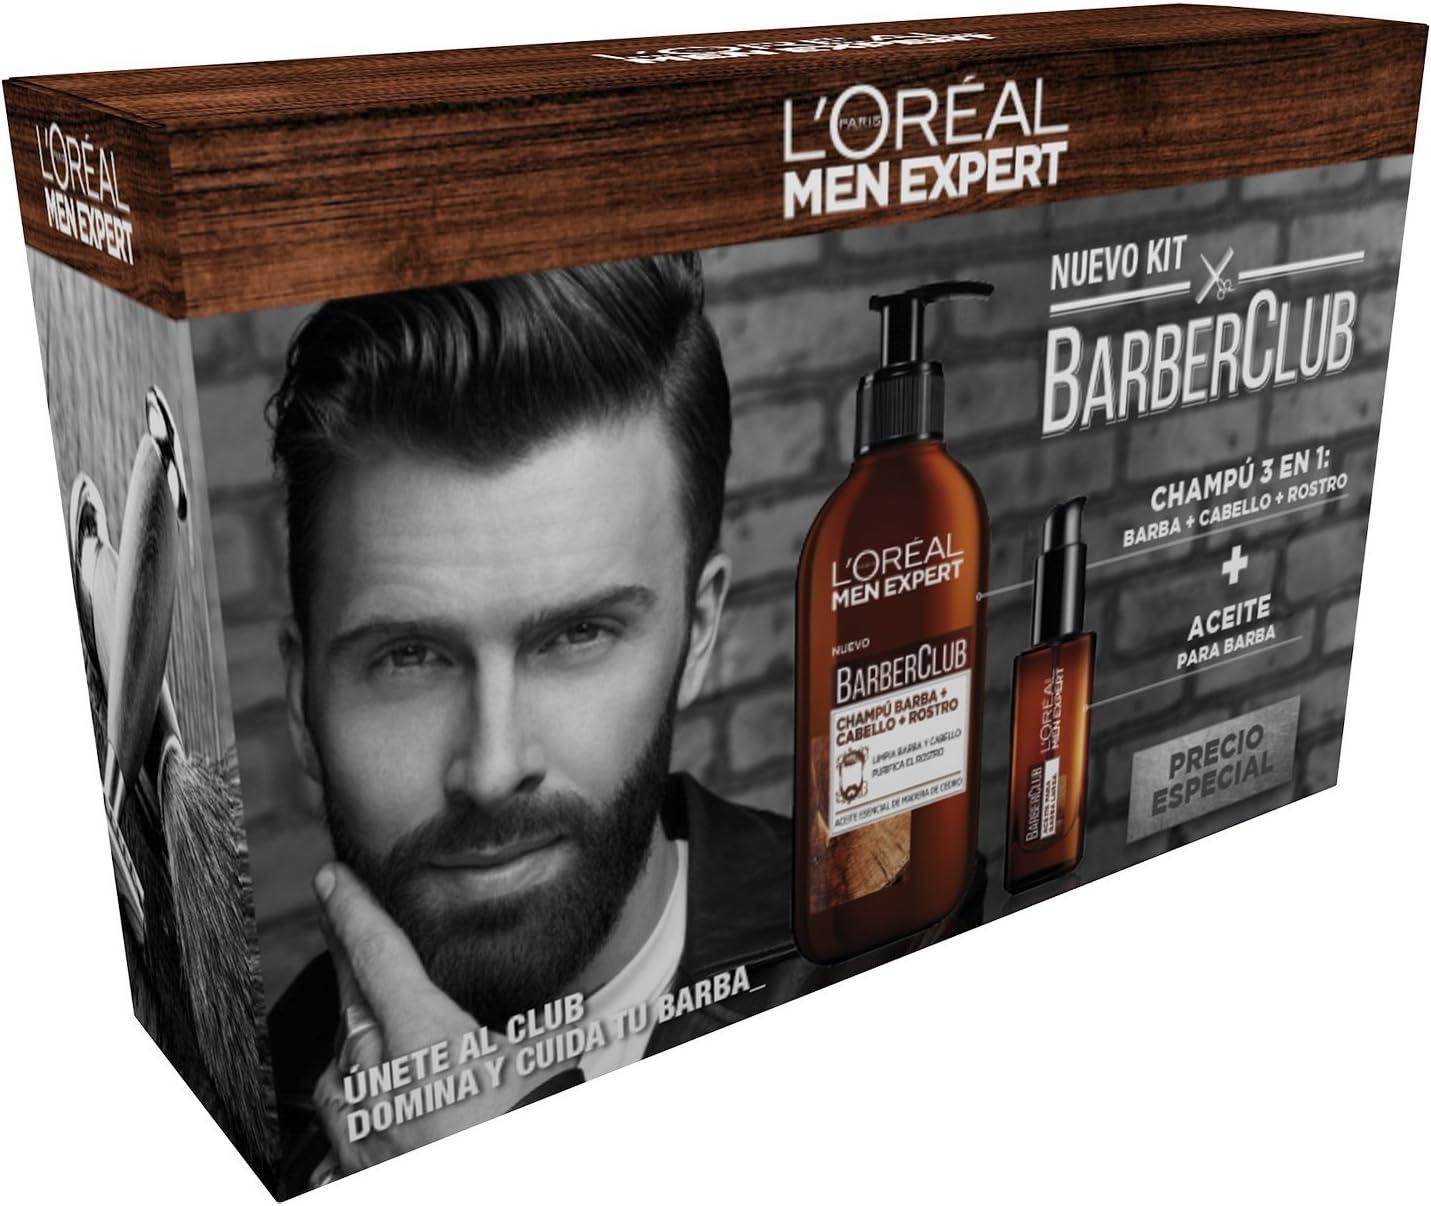 LOréal Men Expert Kit Barber Club - 445 gr: Amazon.es: Belleza